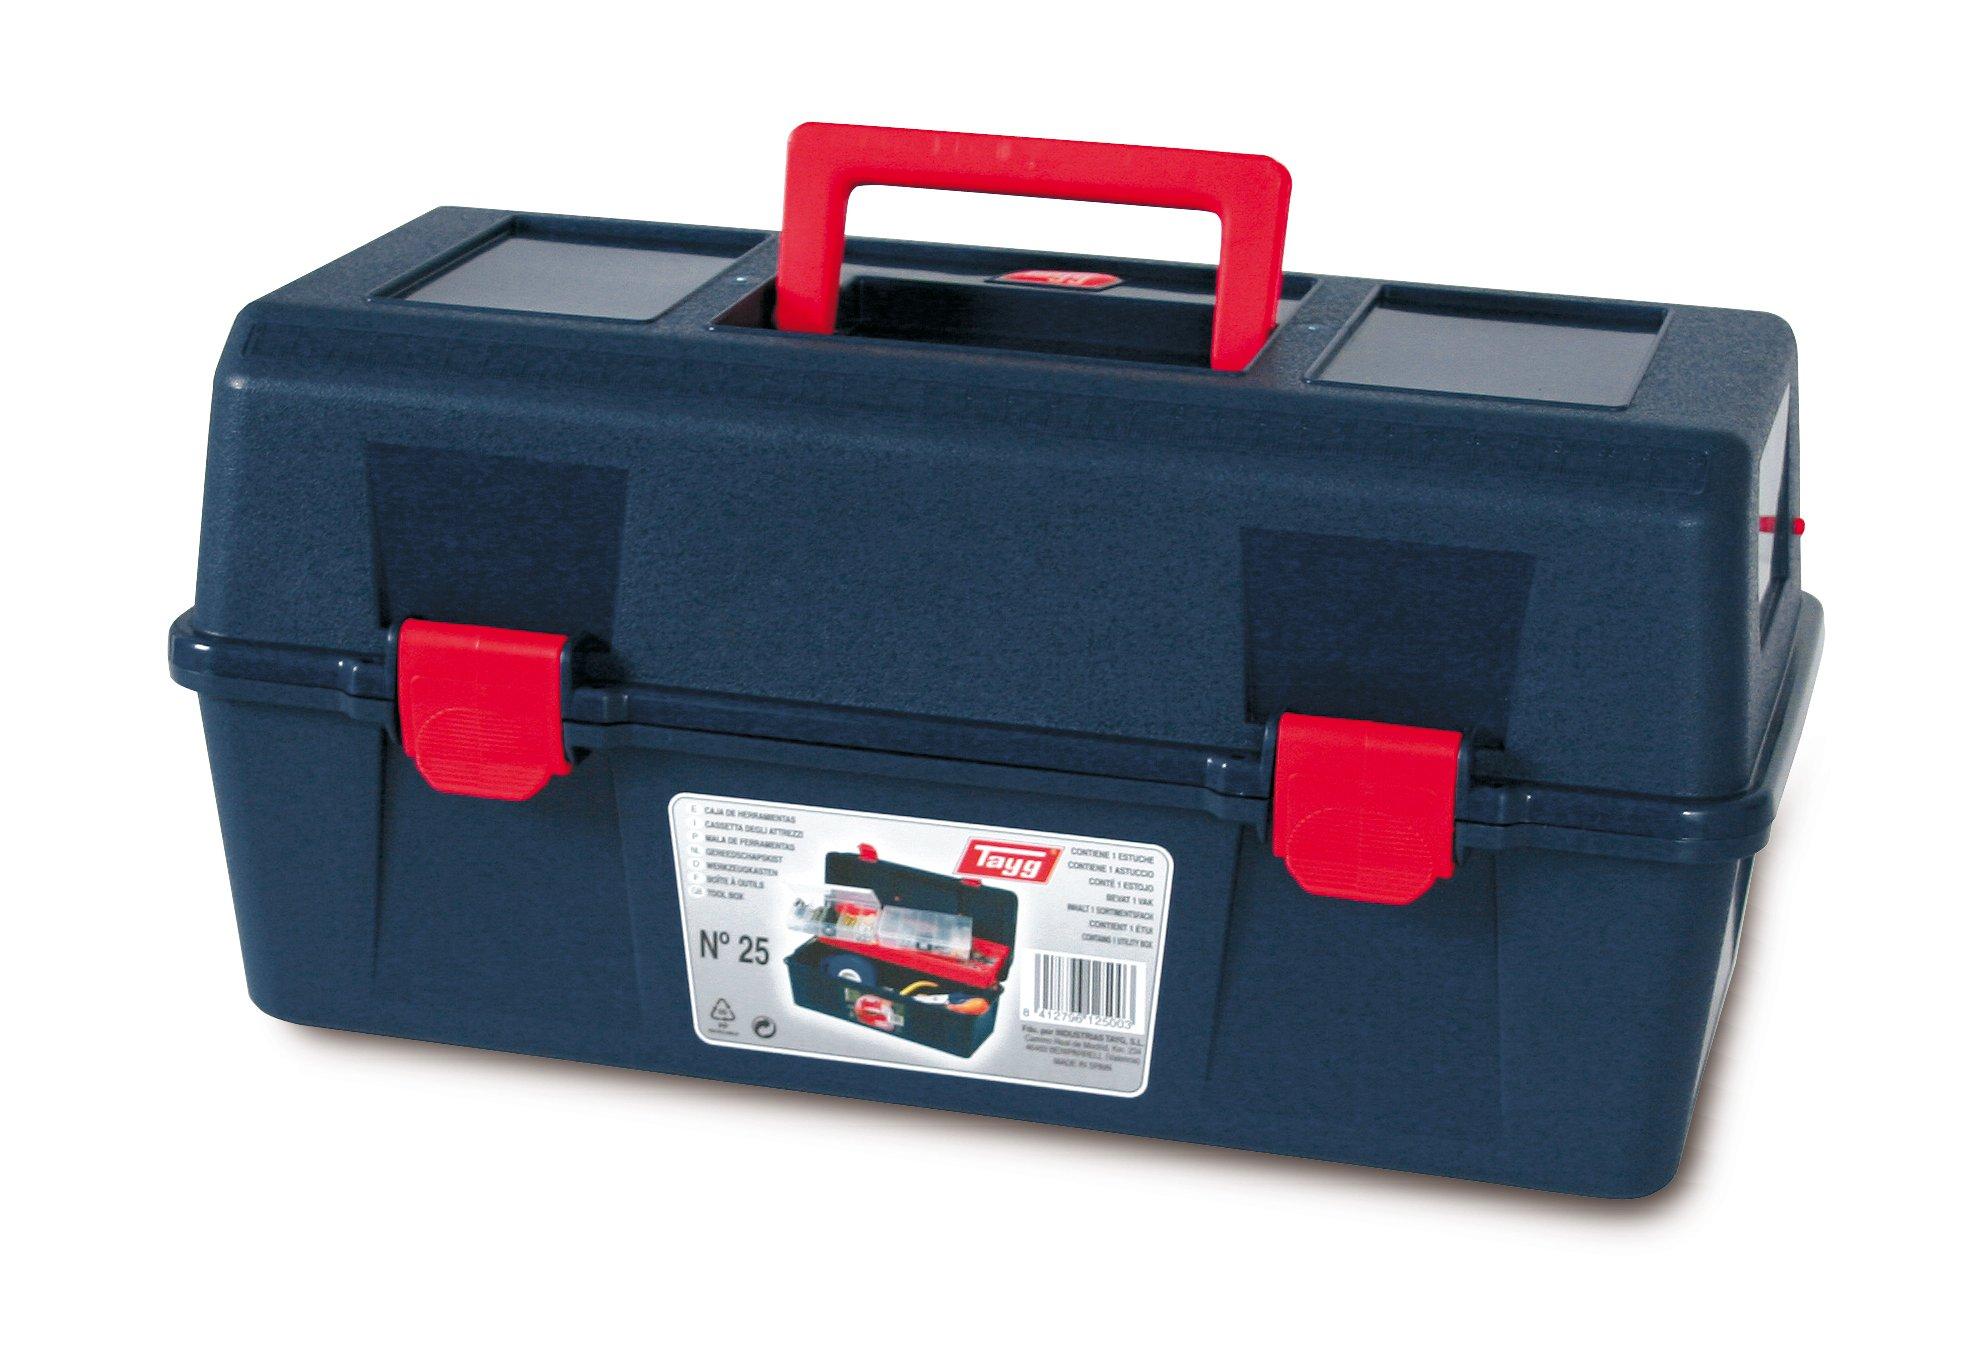 Tayg - Caja herramientas plástico nº 25 product image